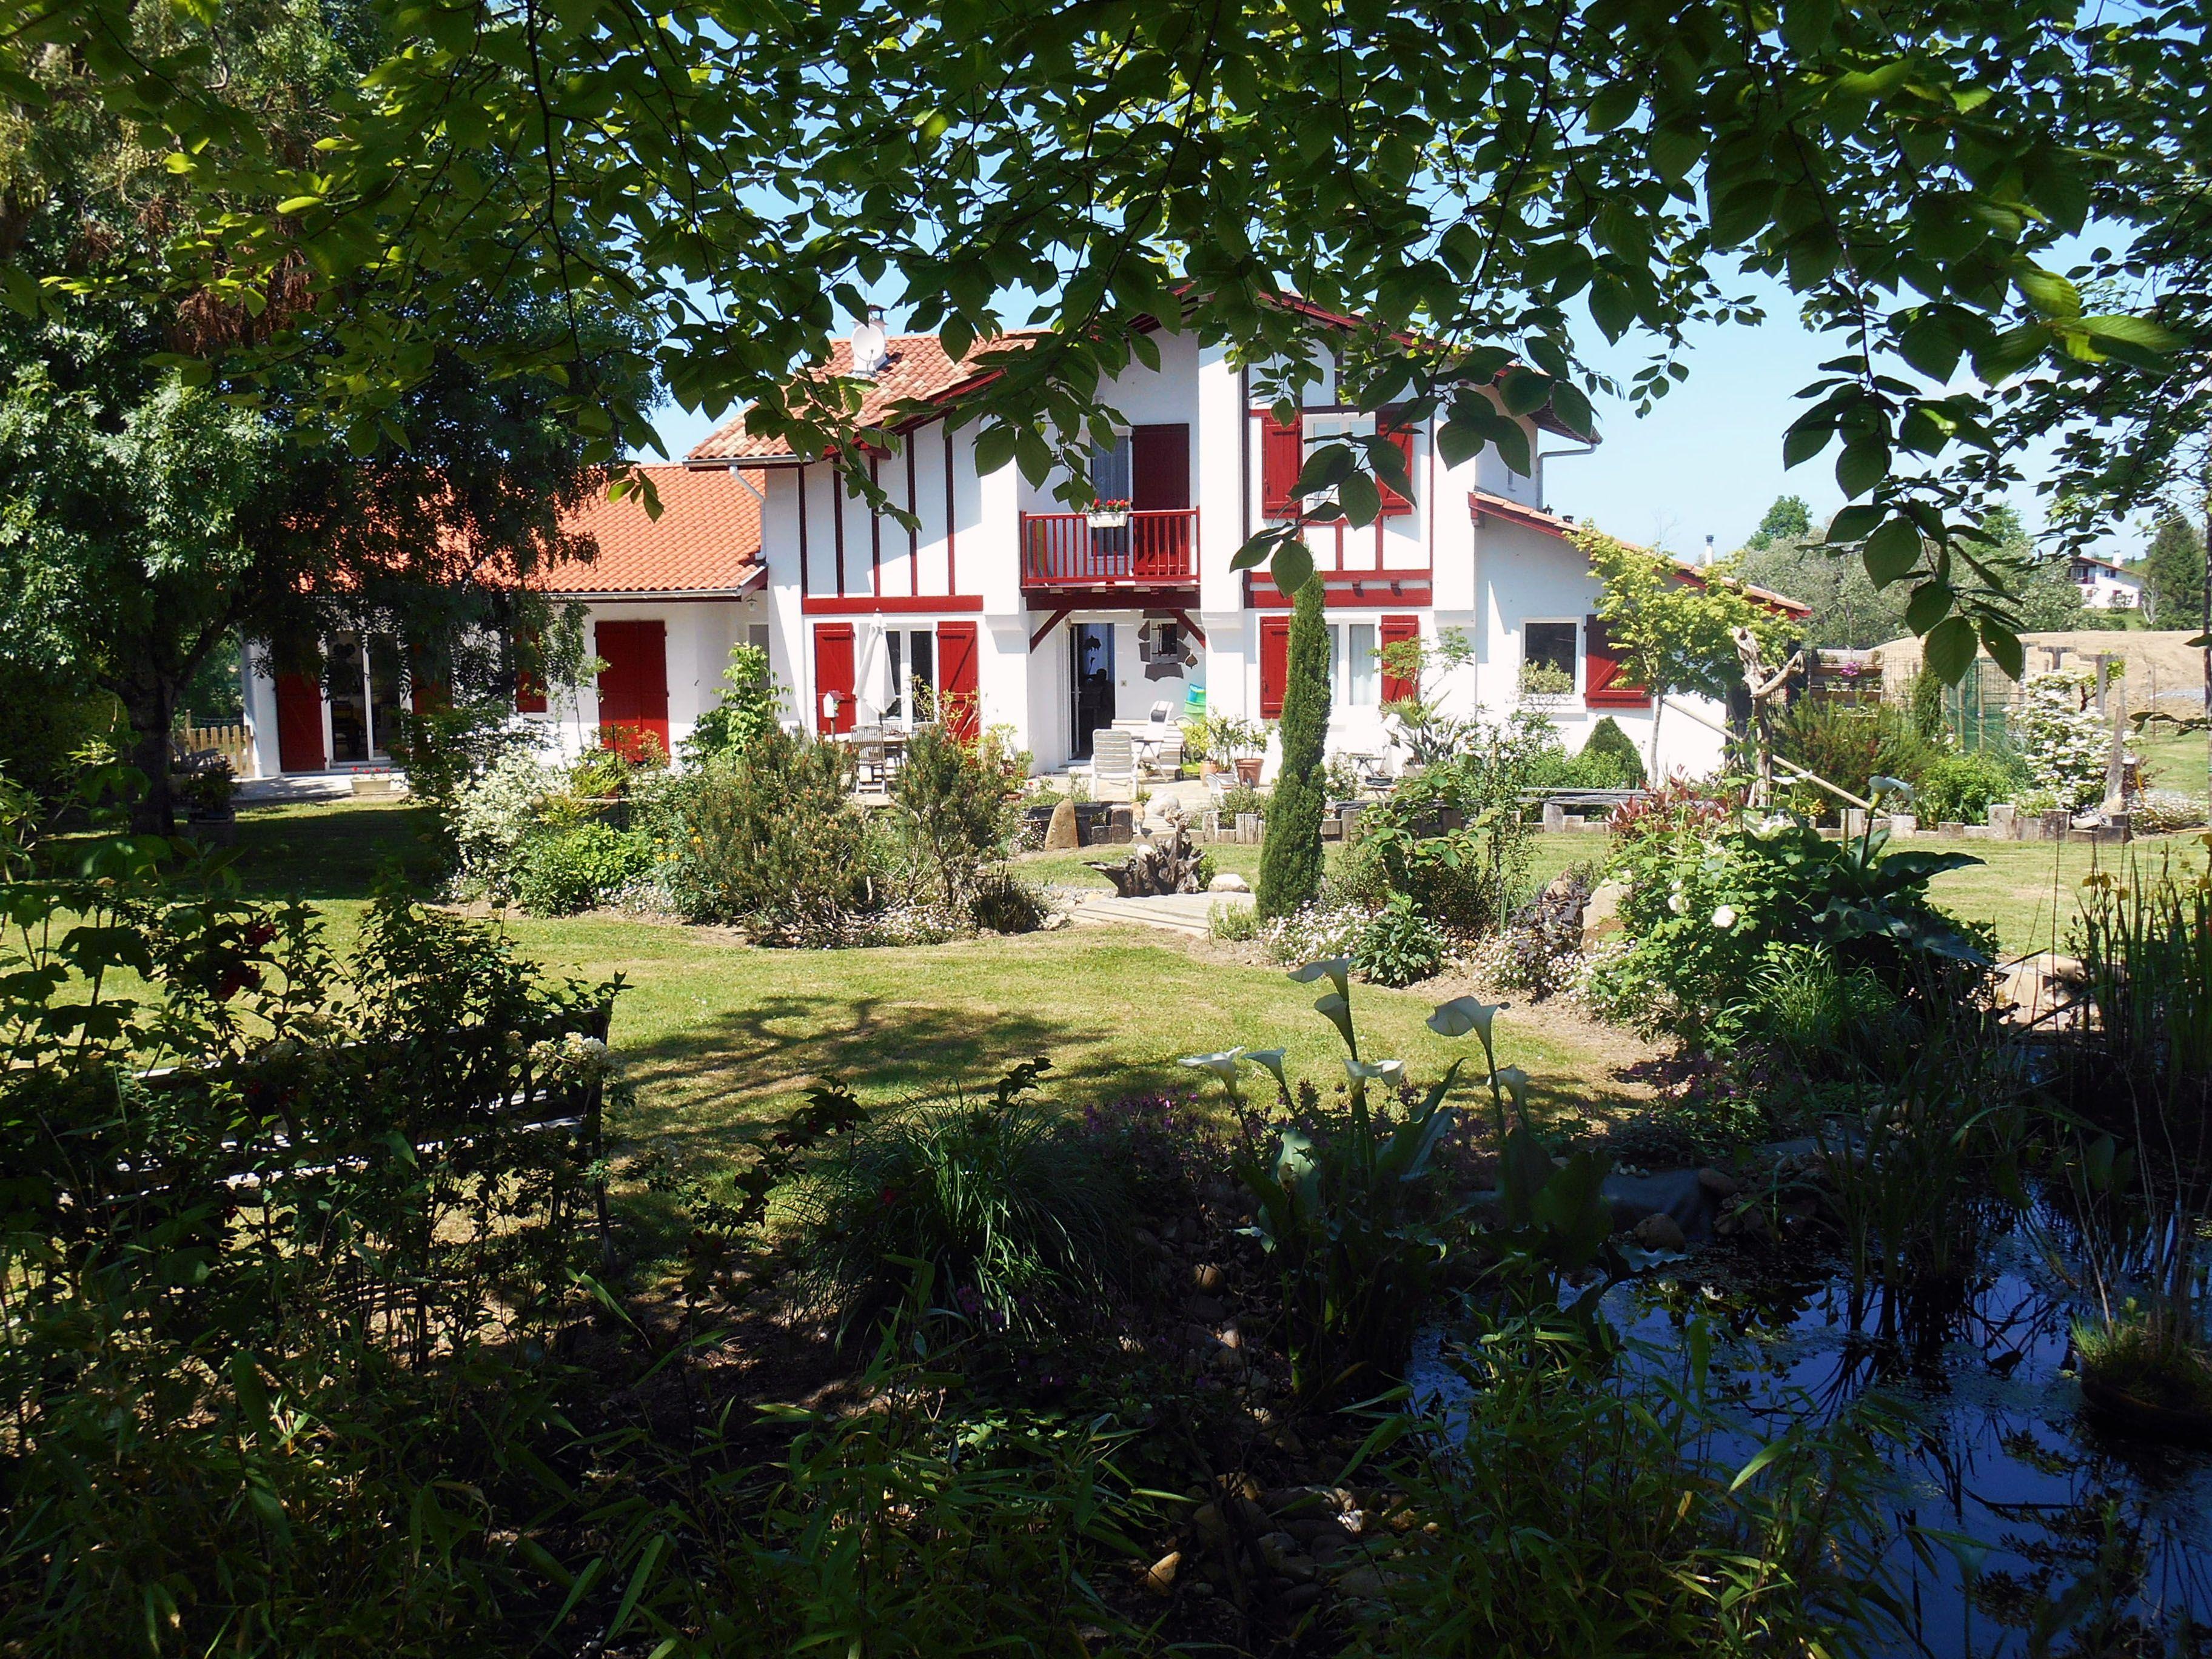 Chambre D Hotes Lanoki Pays Basque Chambre Lorea Larressore Pays Basque Espelette Basque